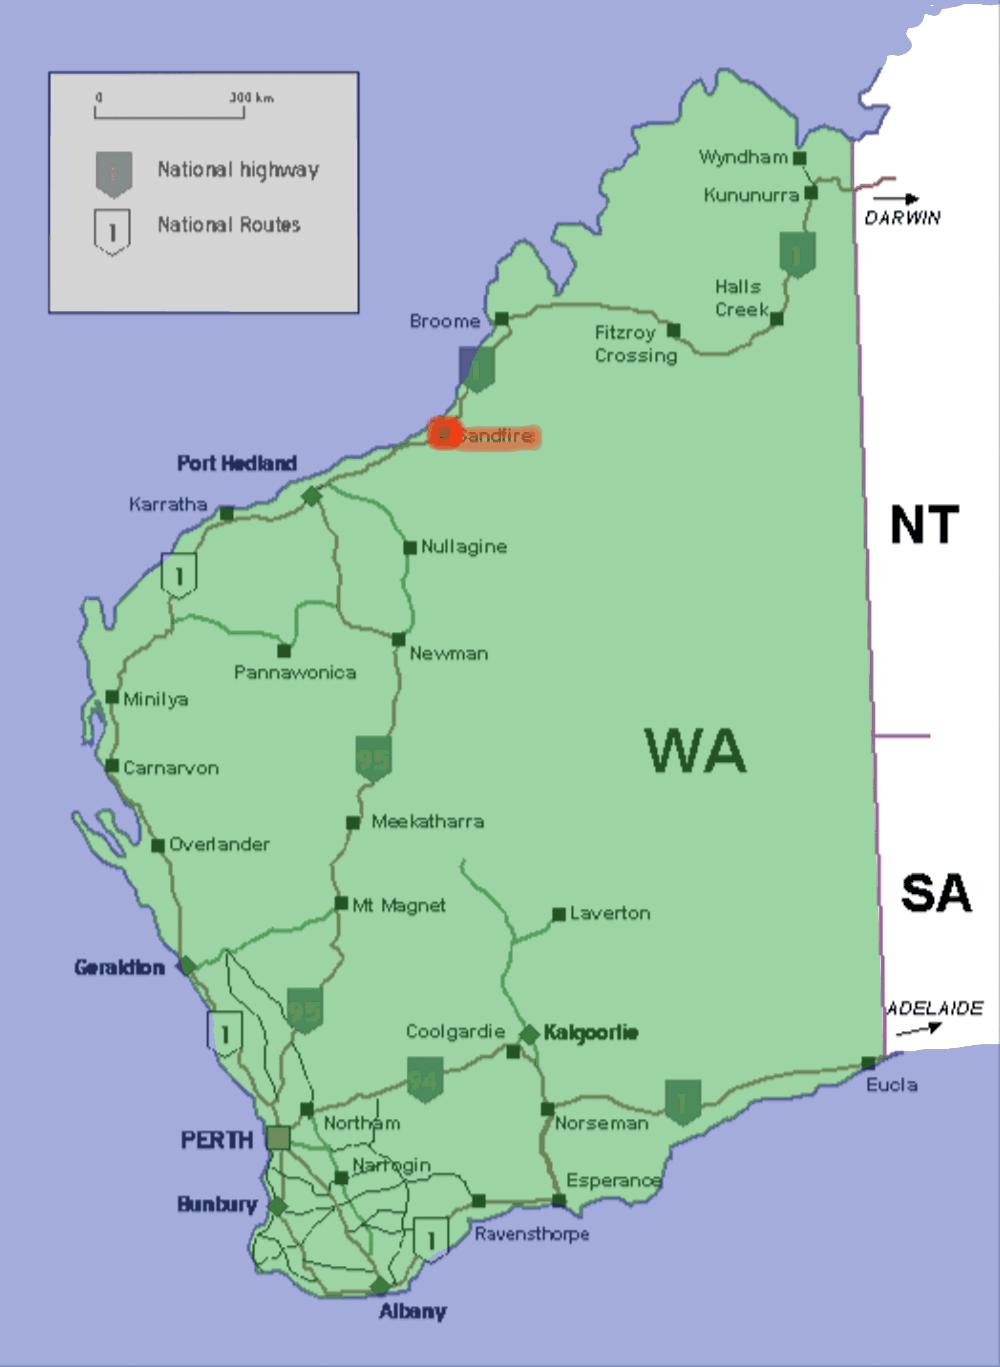 Sandfire Western Australia Wikipedia